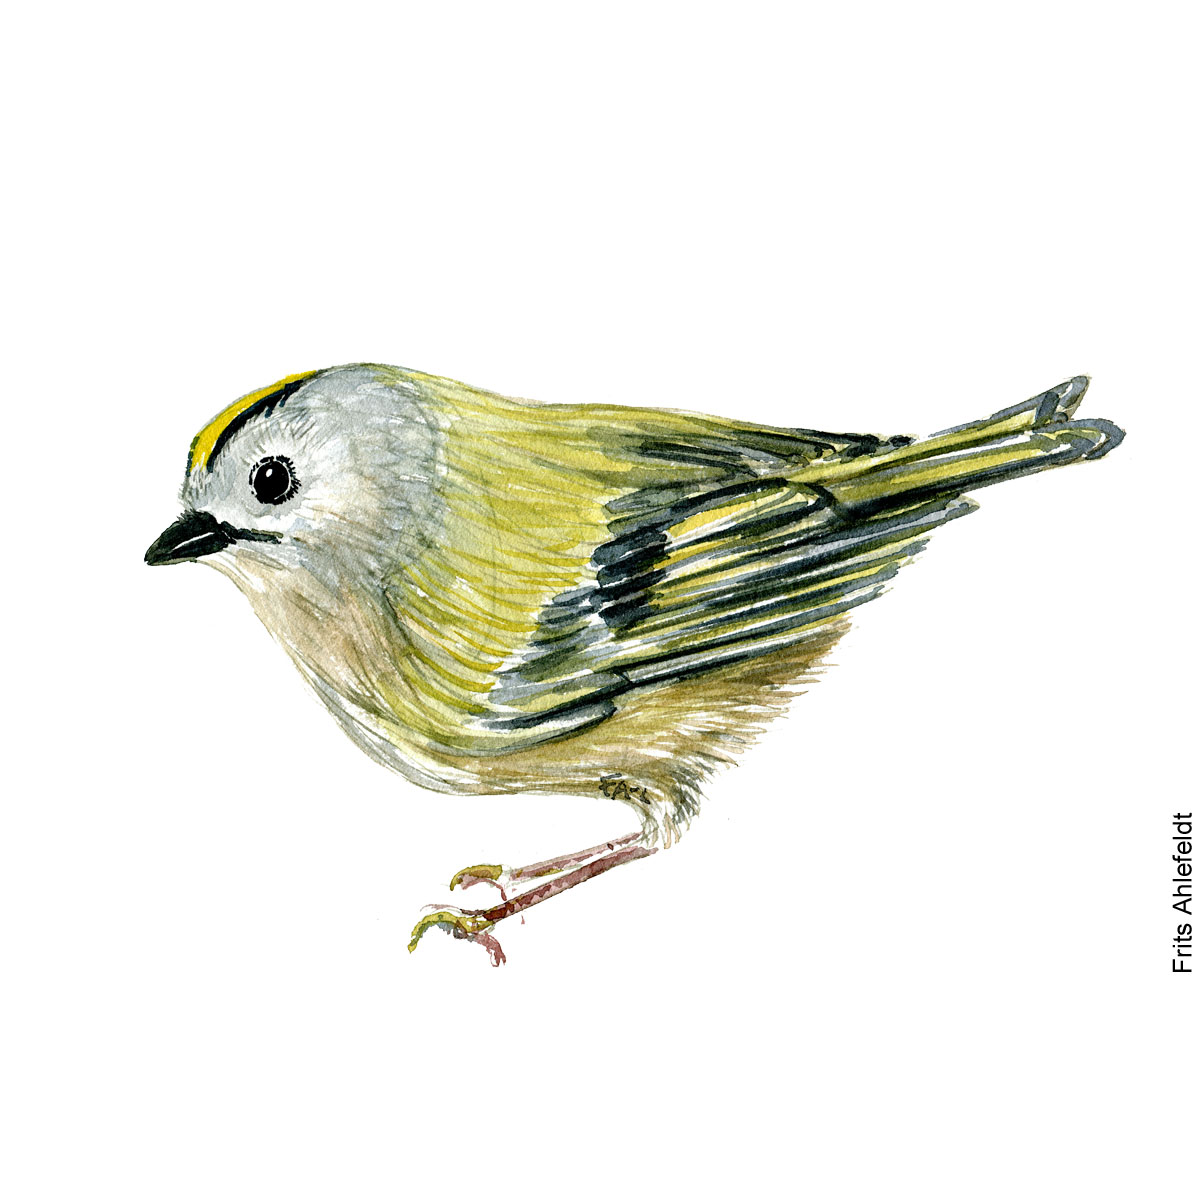 Goldcrest bird watercolor painting. Artwork by Frits Ahlefeldt. Fugle akvarel